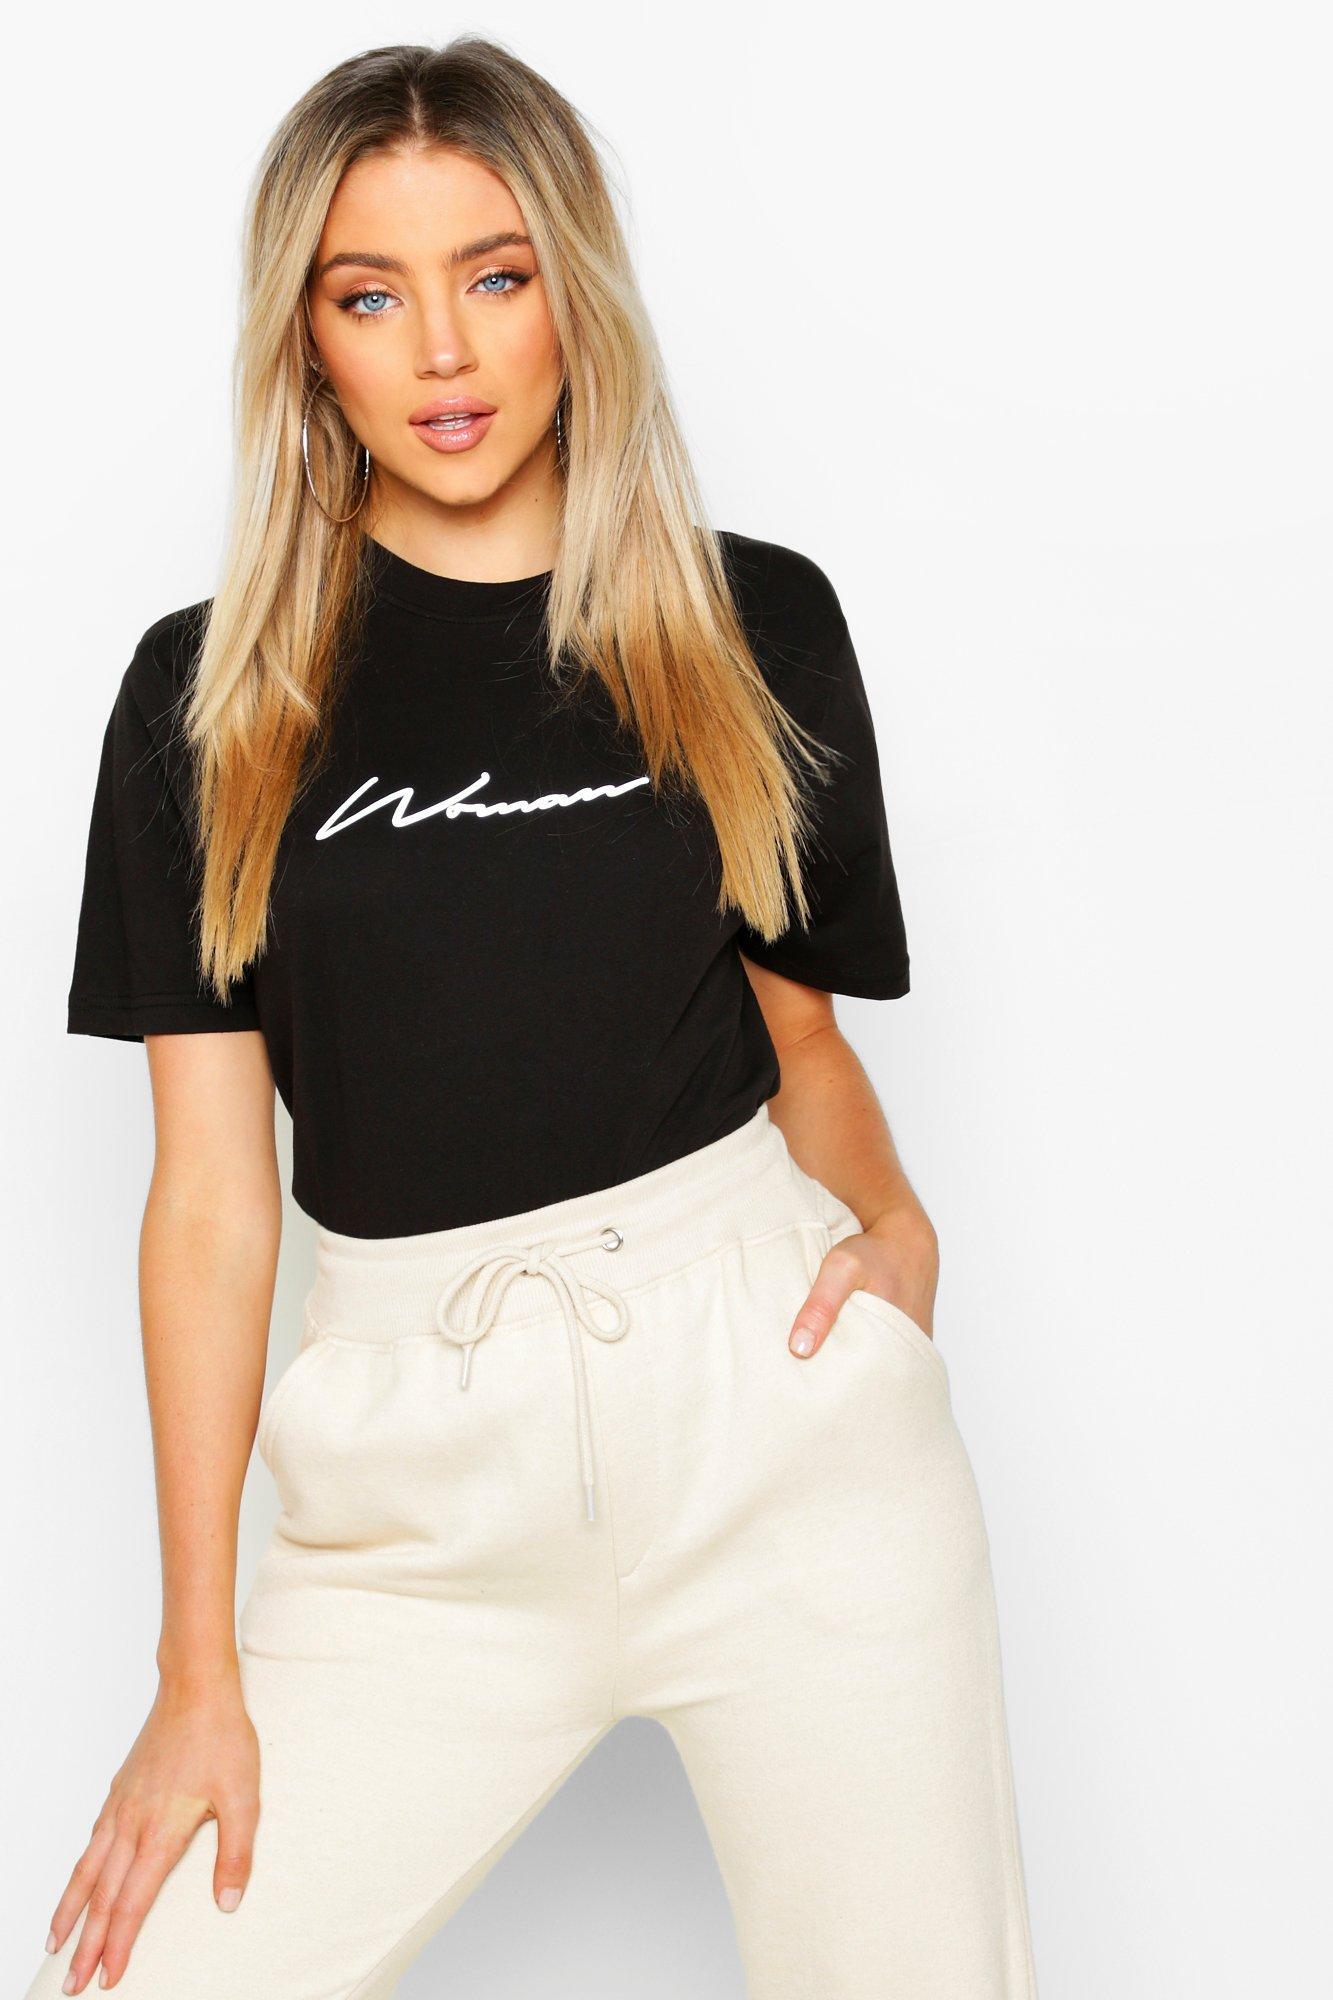 Womens T-Shirt mit reflektierendem Woman-Schriftzug - schwarz - 34, Schwarz - Boohoo.com